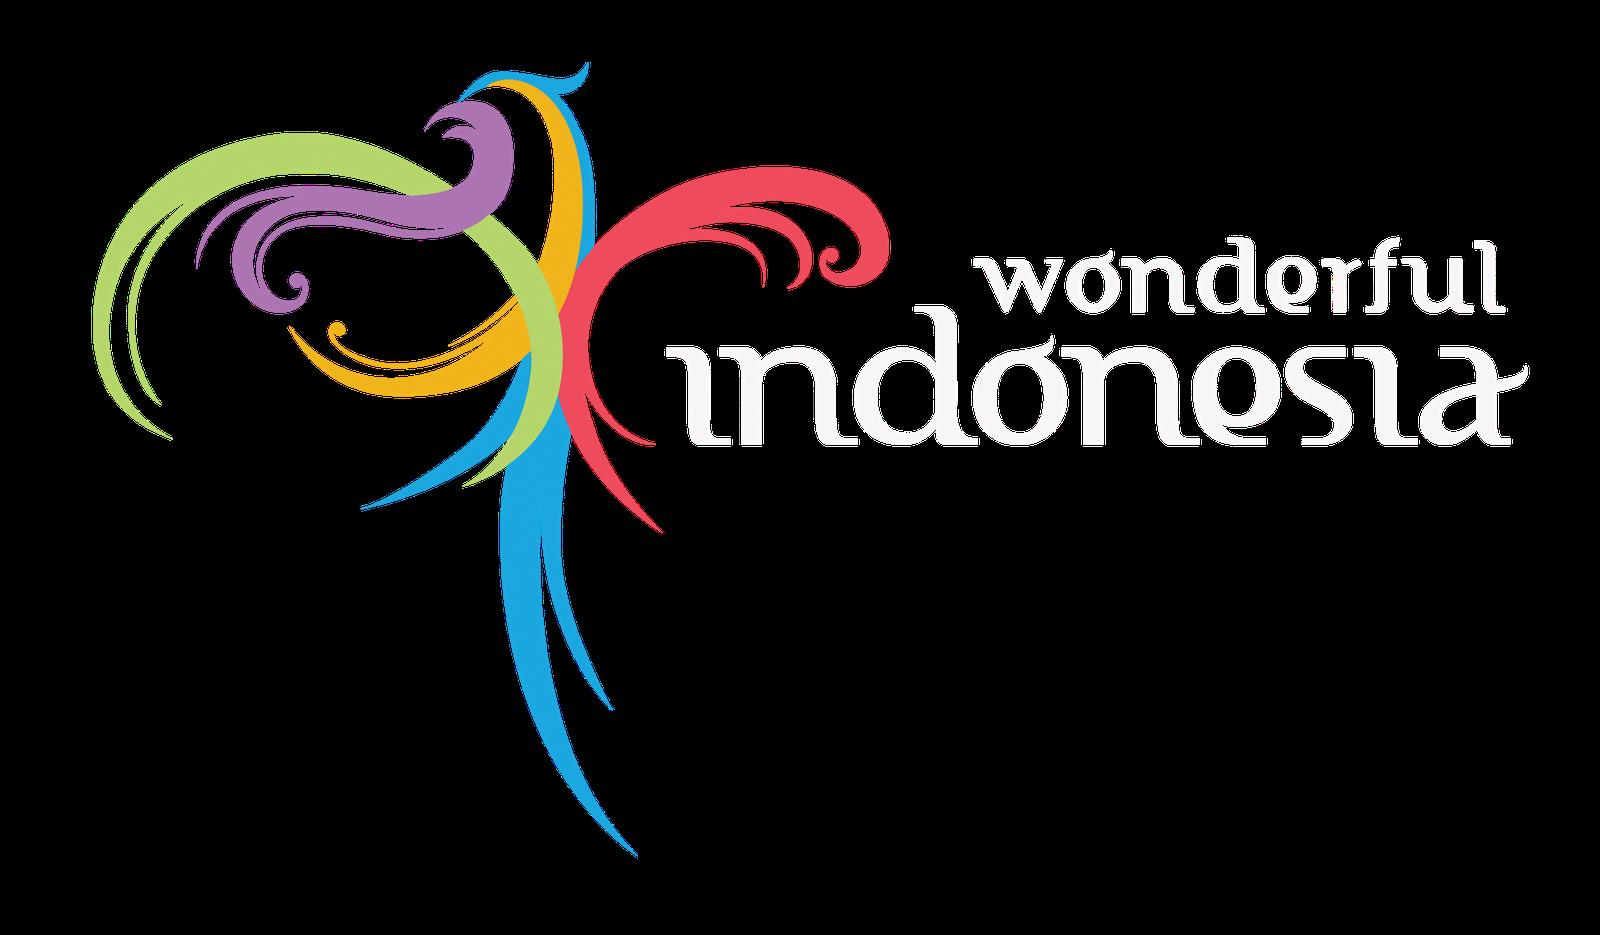 Wonderful Indonesia Logo White.png